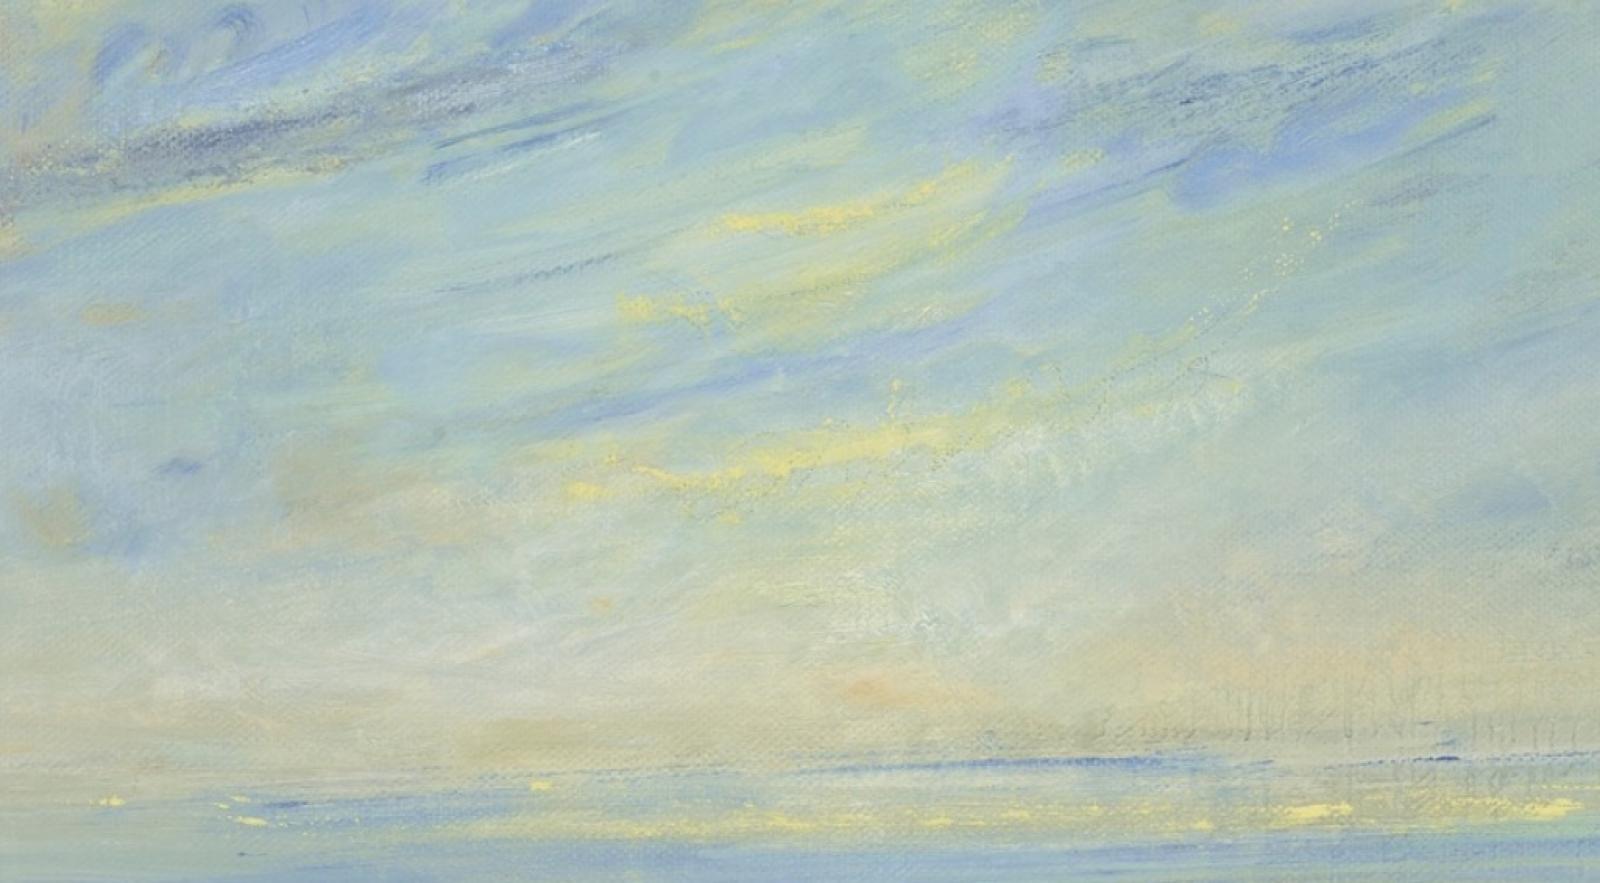 Celia Paul: The Sea and The Mirror